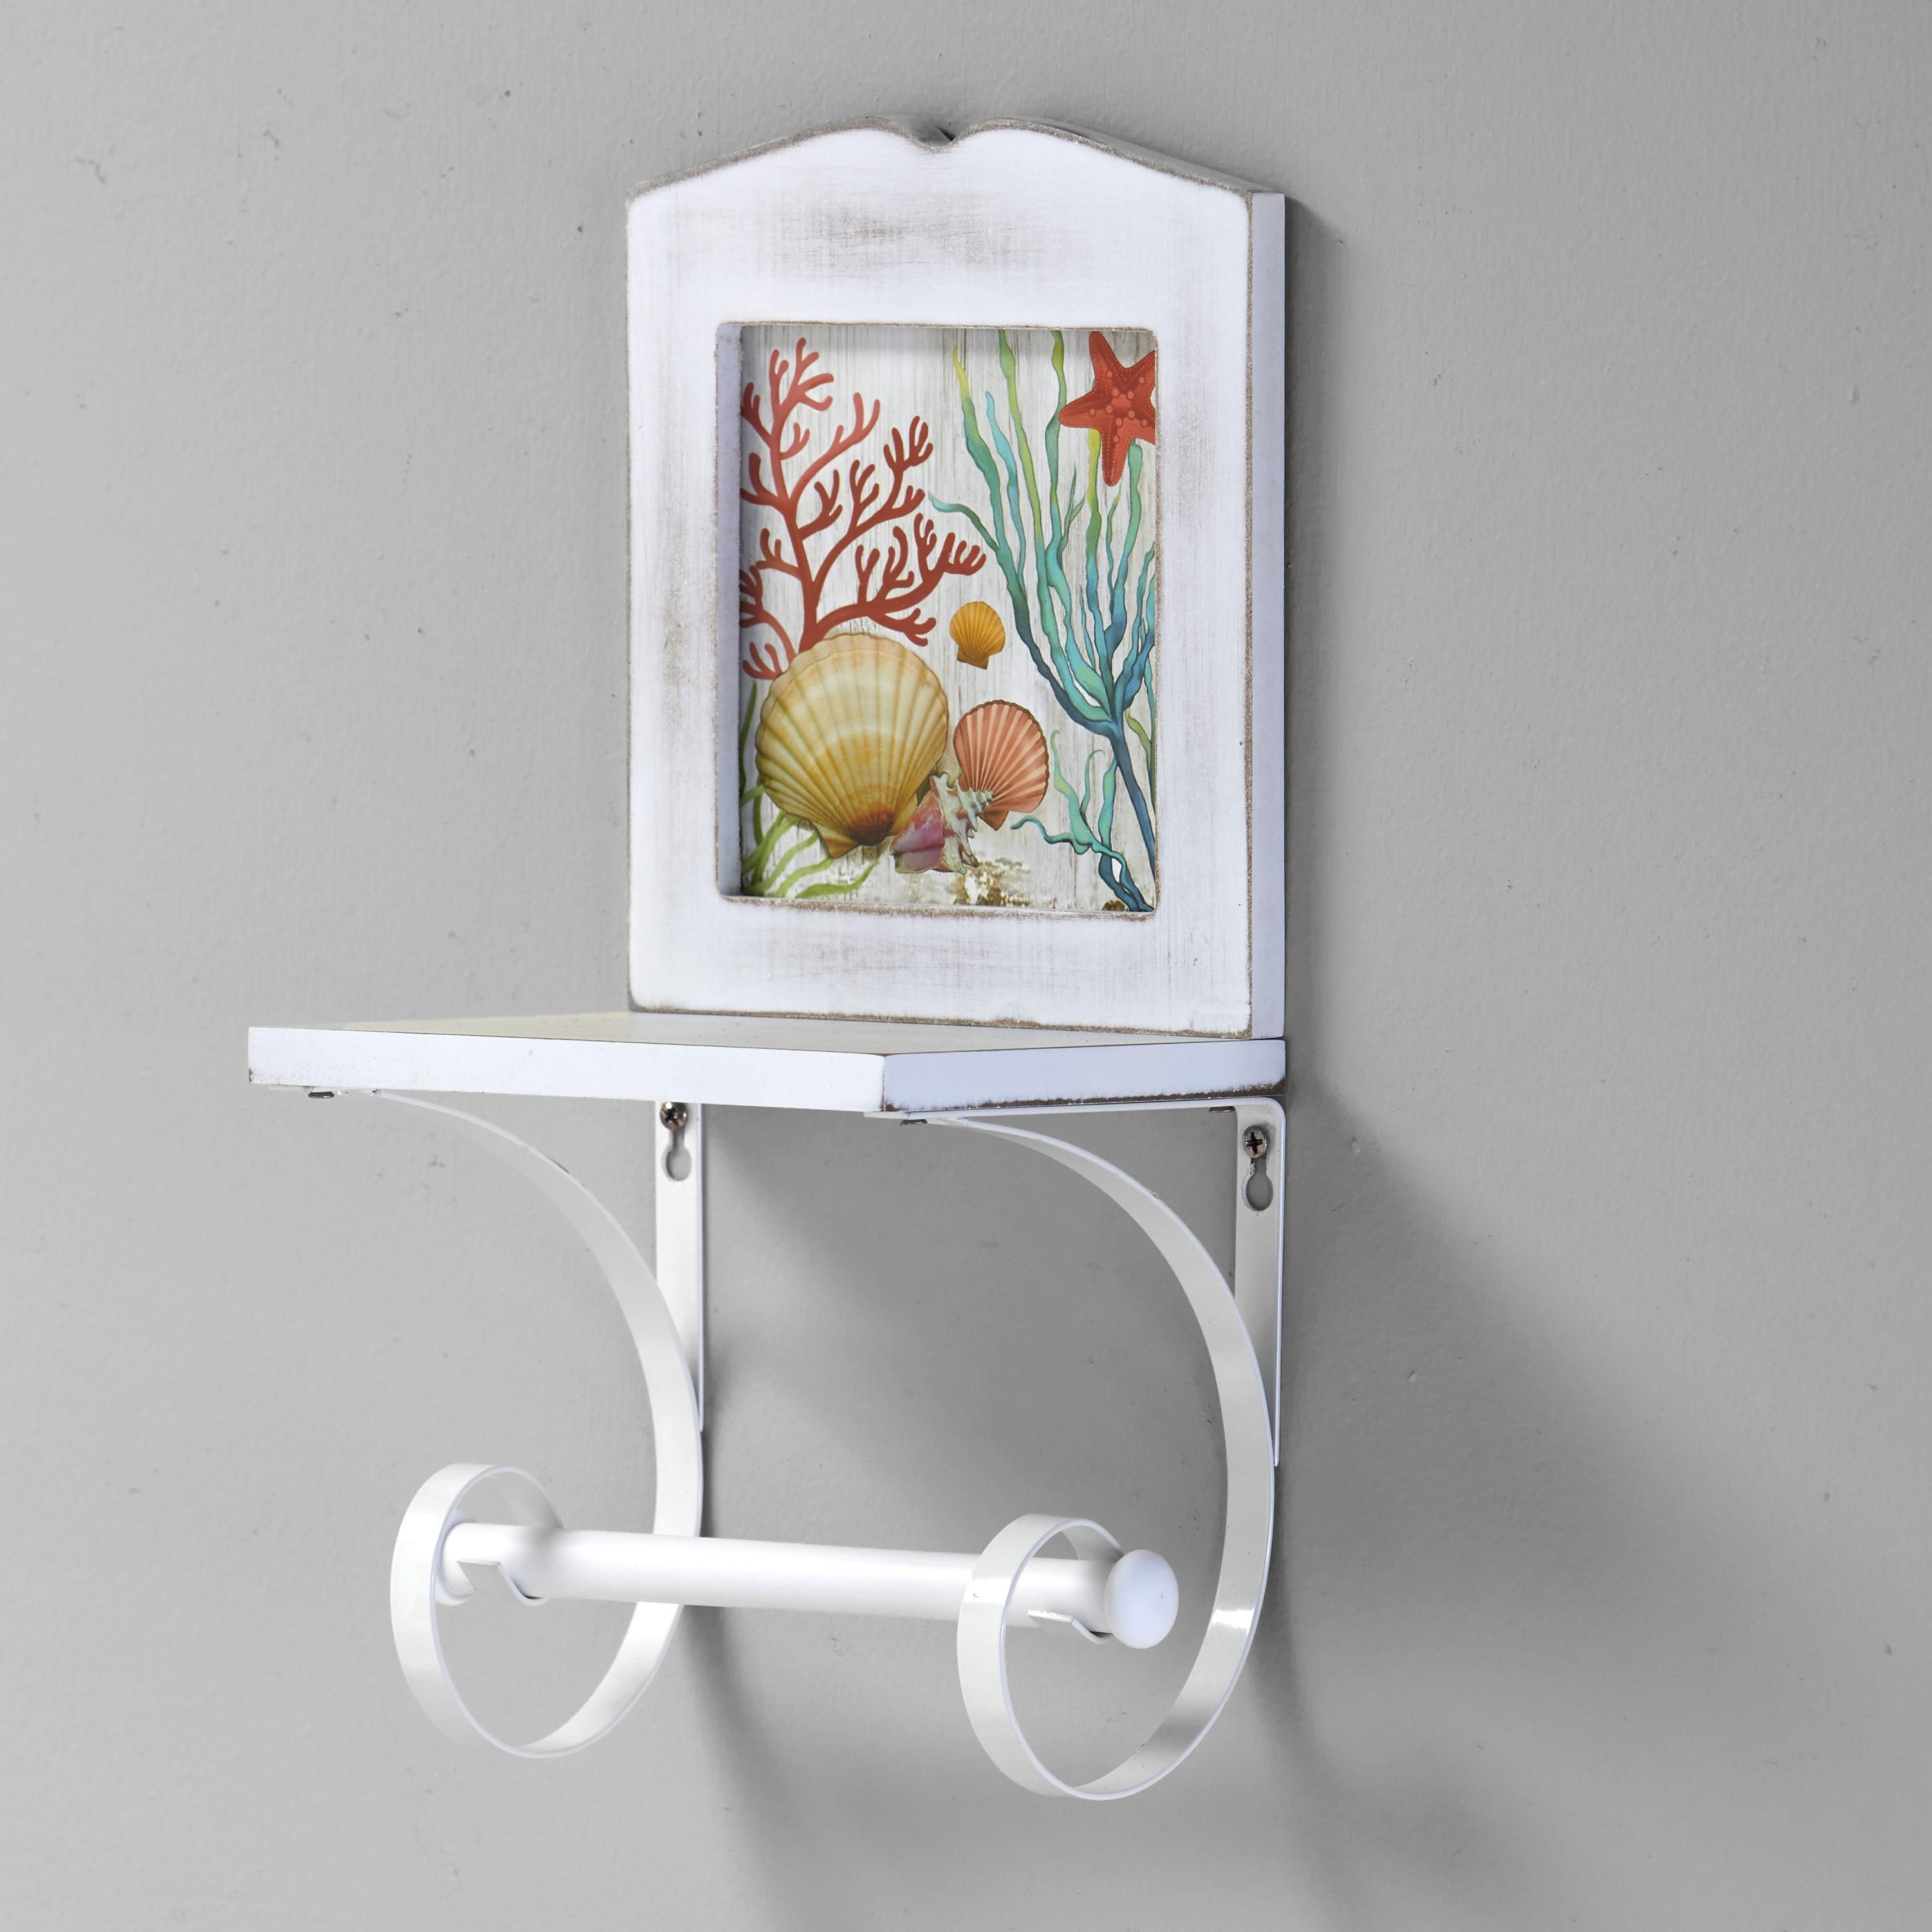 Coastal Toilet Roll Holder For Wall Unique Nautical Toilet Paper Storage Ebay